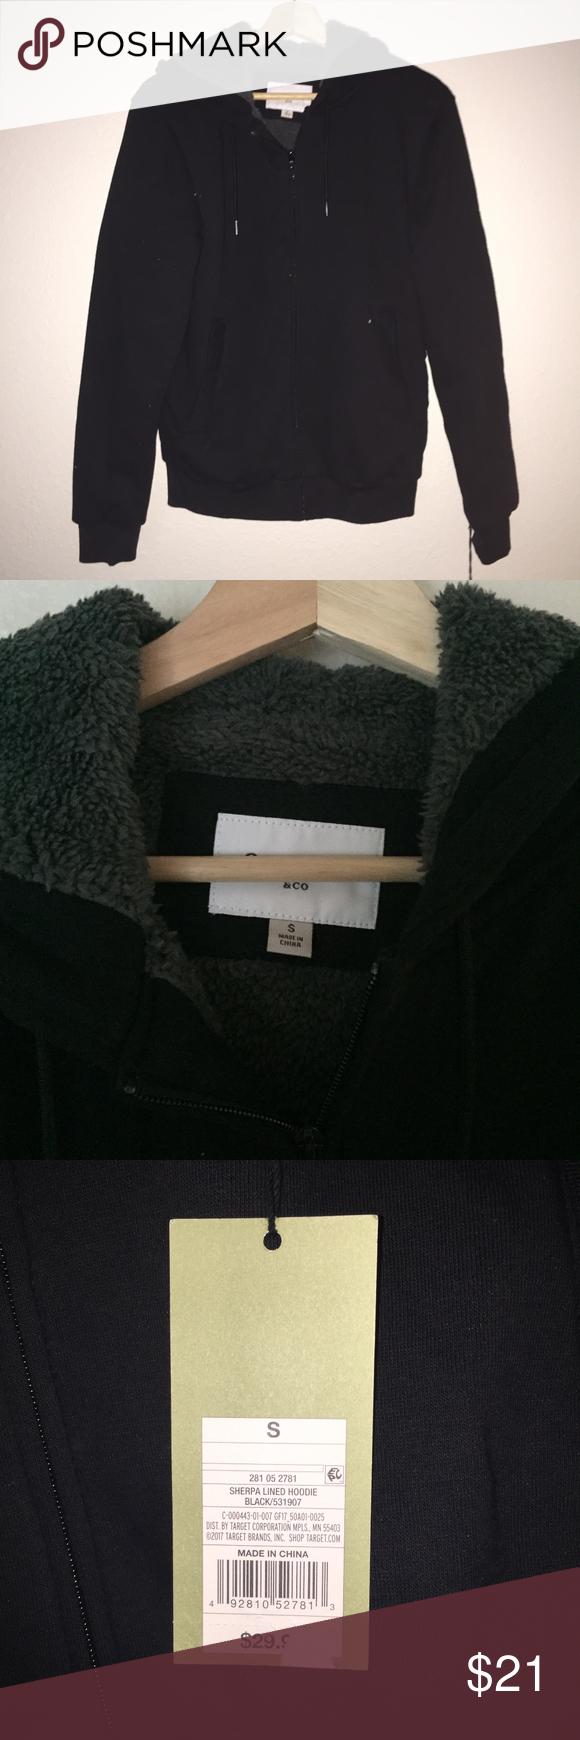 Menus new winter warm thicken cotton trench coats fleece jackets